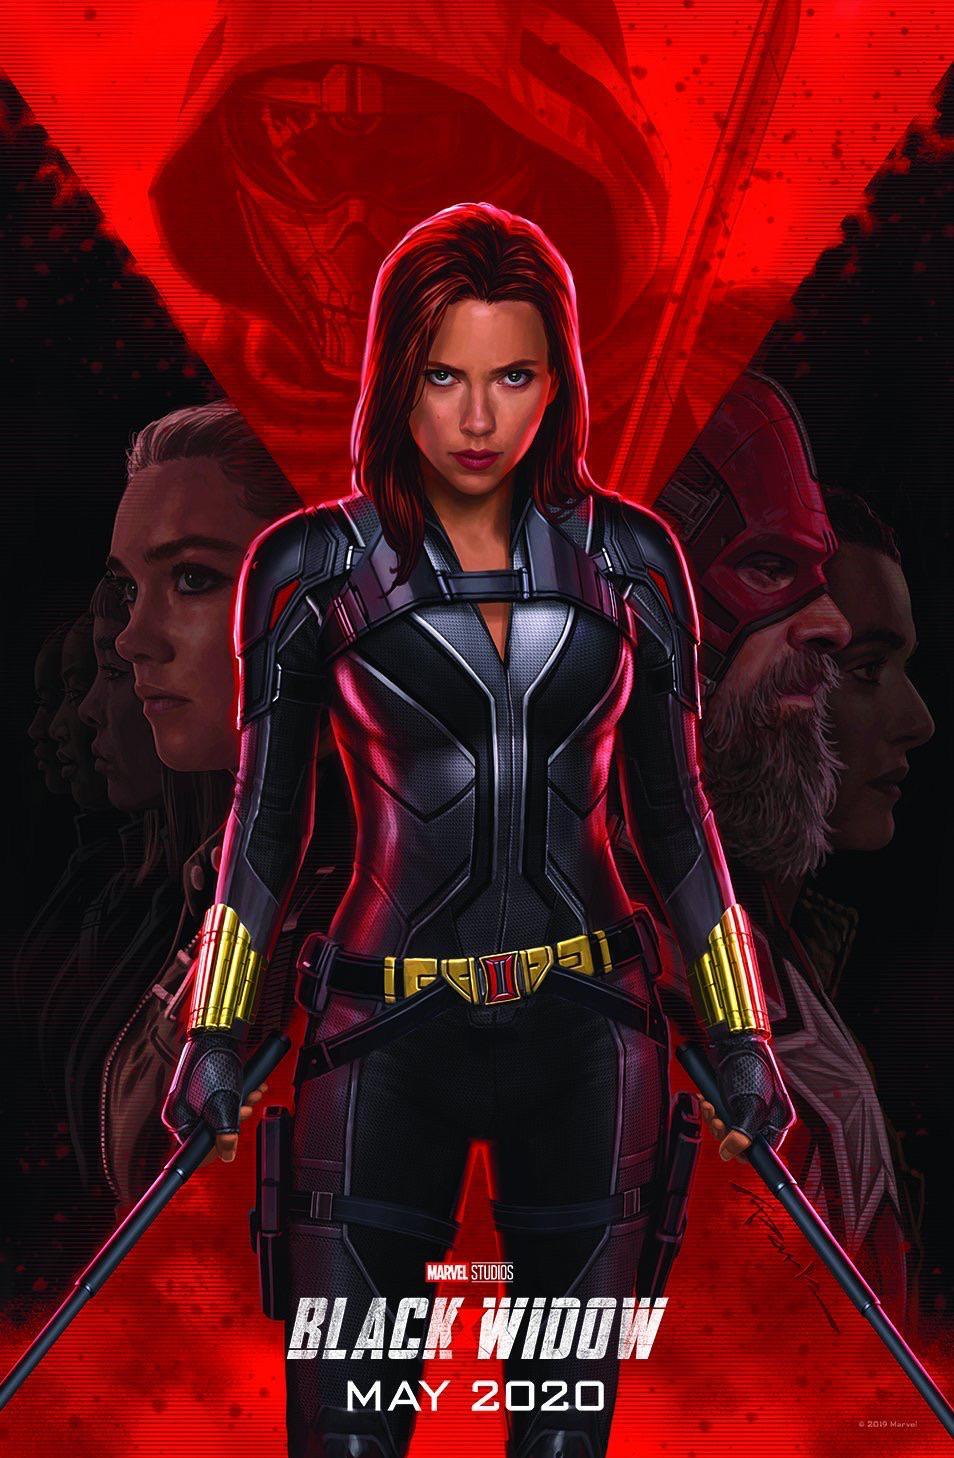 Black Widow (film) poster 001.jpg